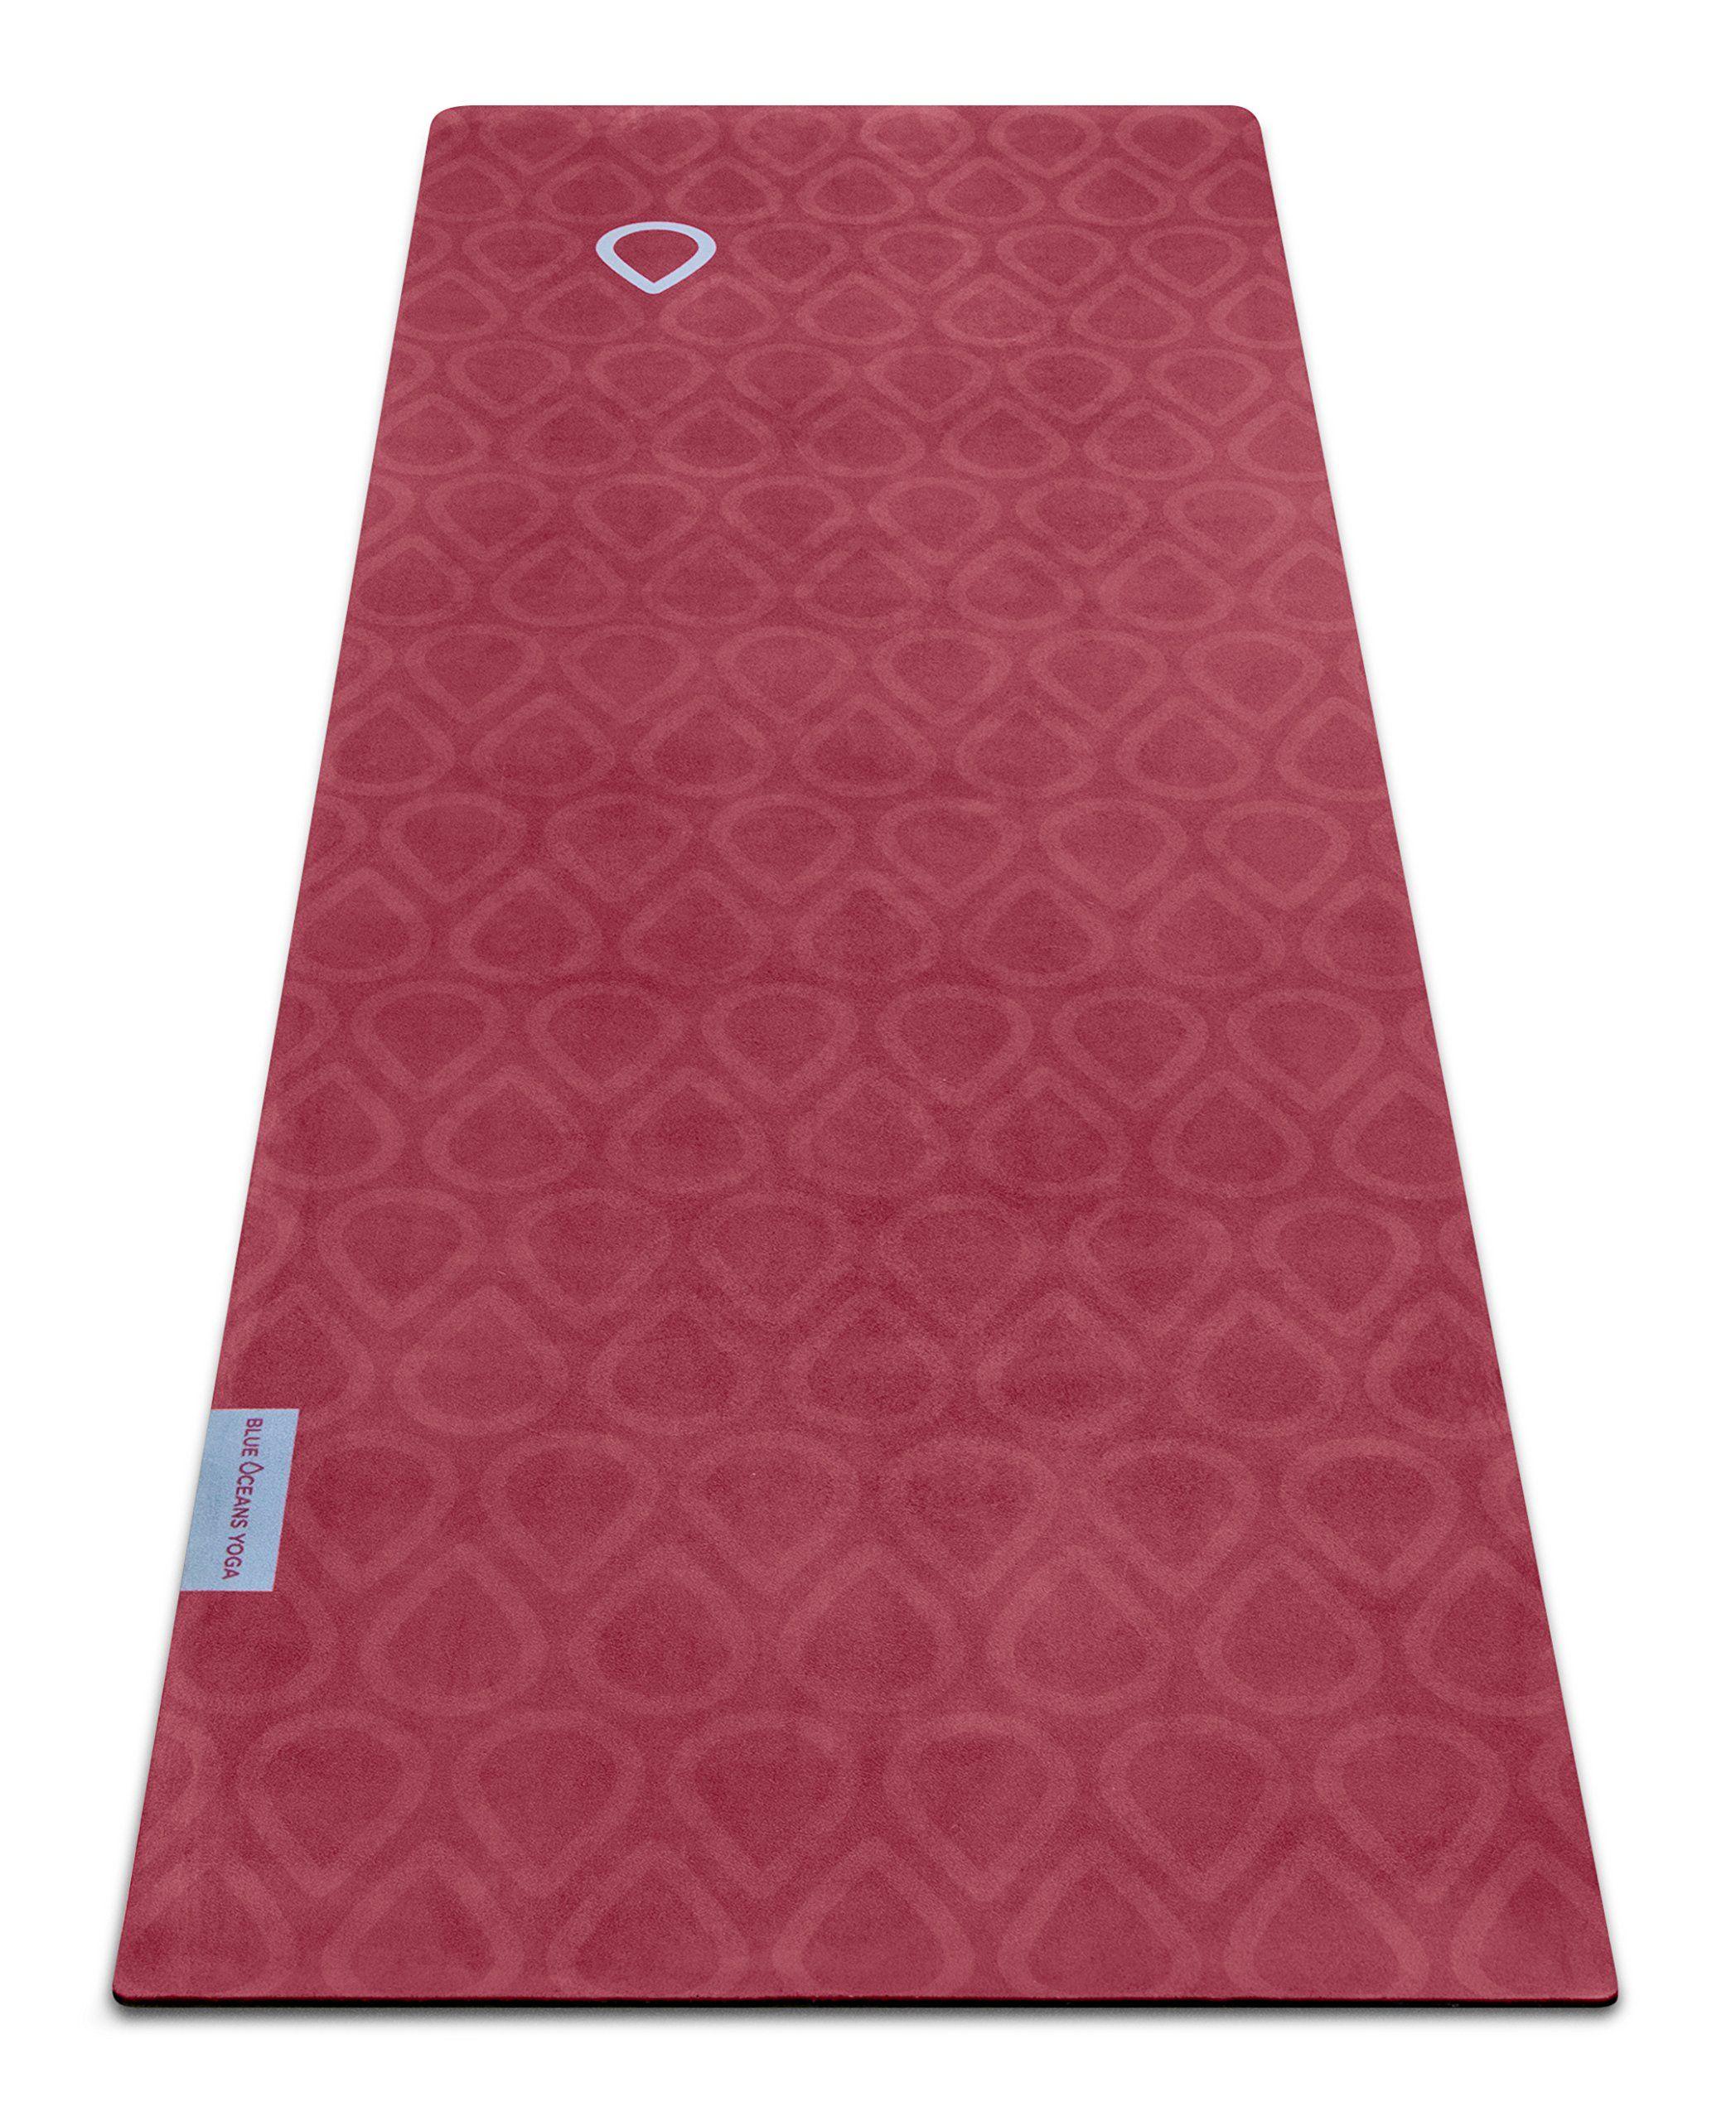 mat mats yoga dsc bikram product towel